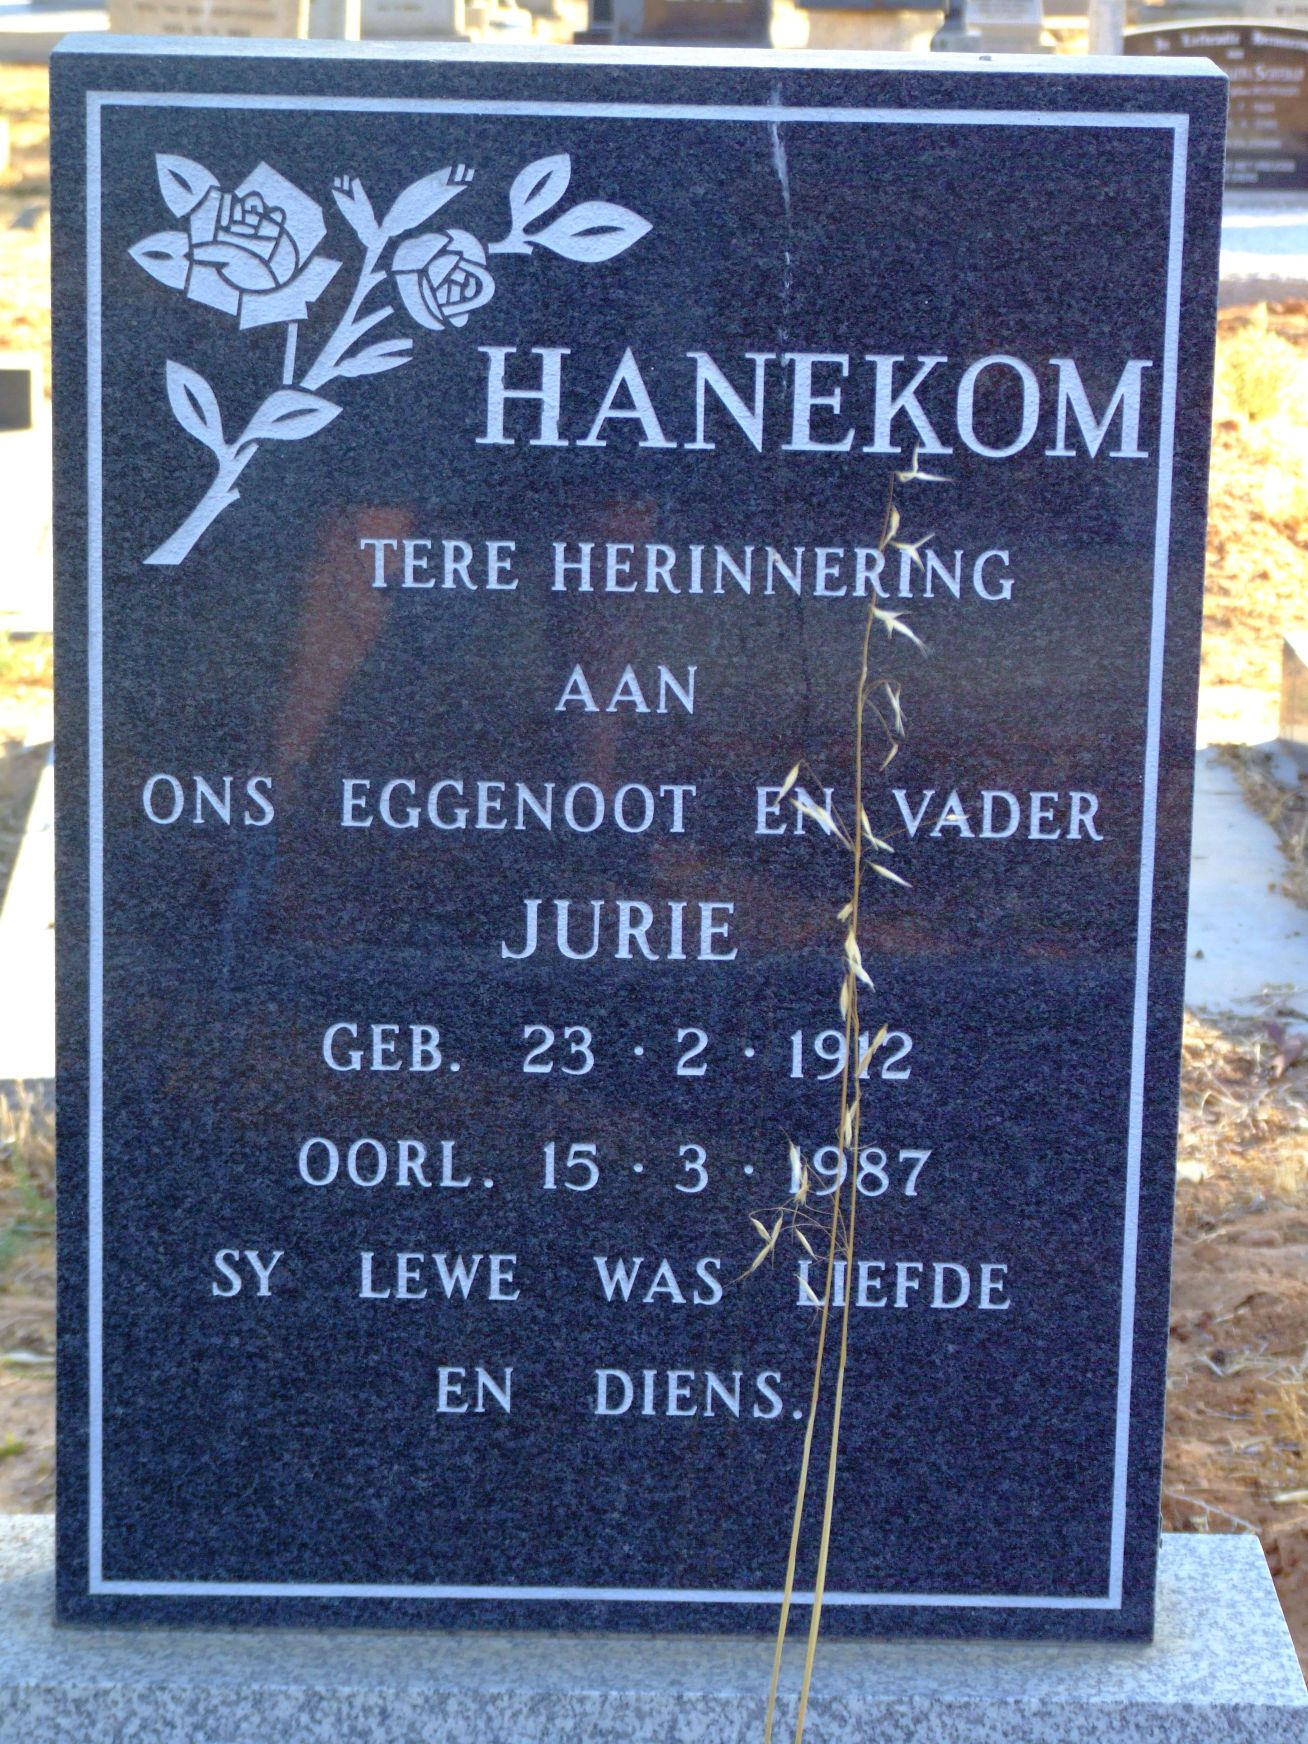 Hanekom Jurie